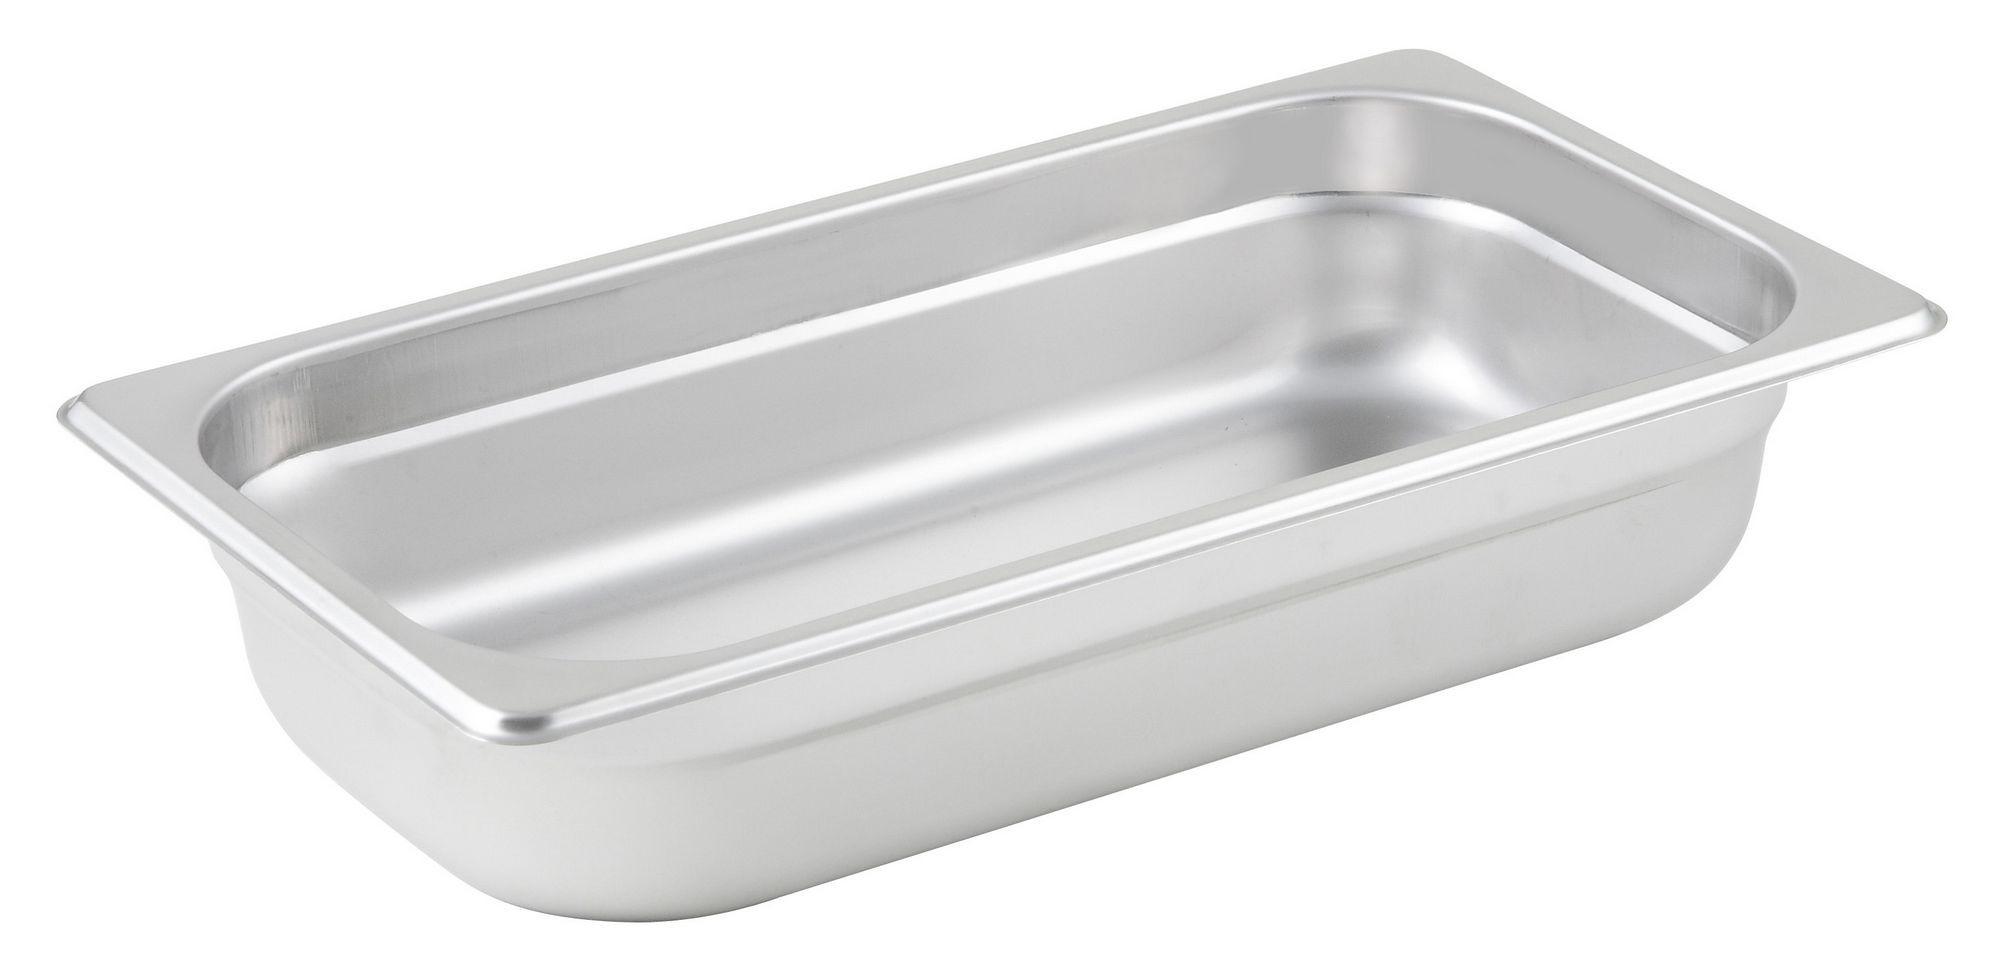 Winco Third Size Anti-Jamming Steam Table Pan (23 Gauge, 2.5